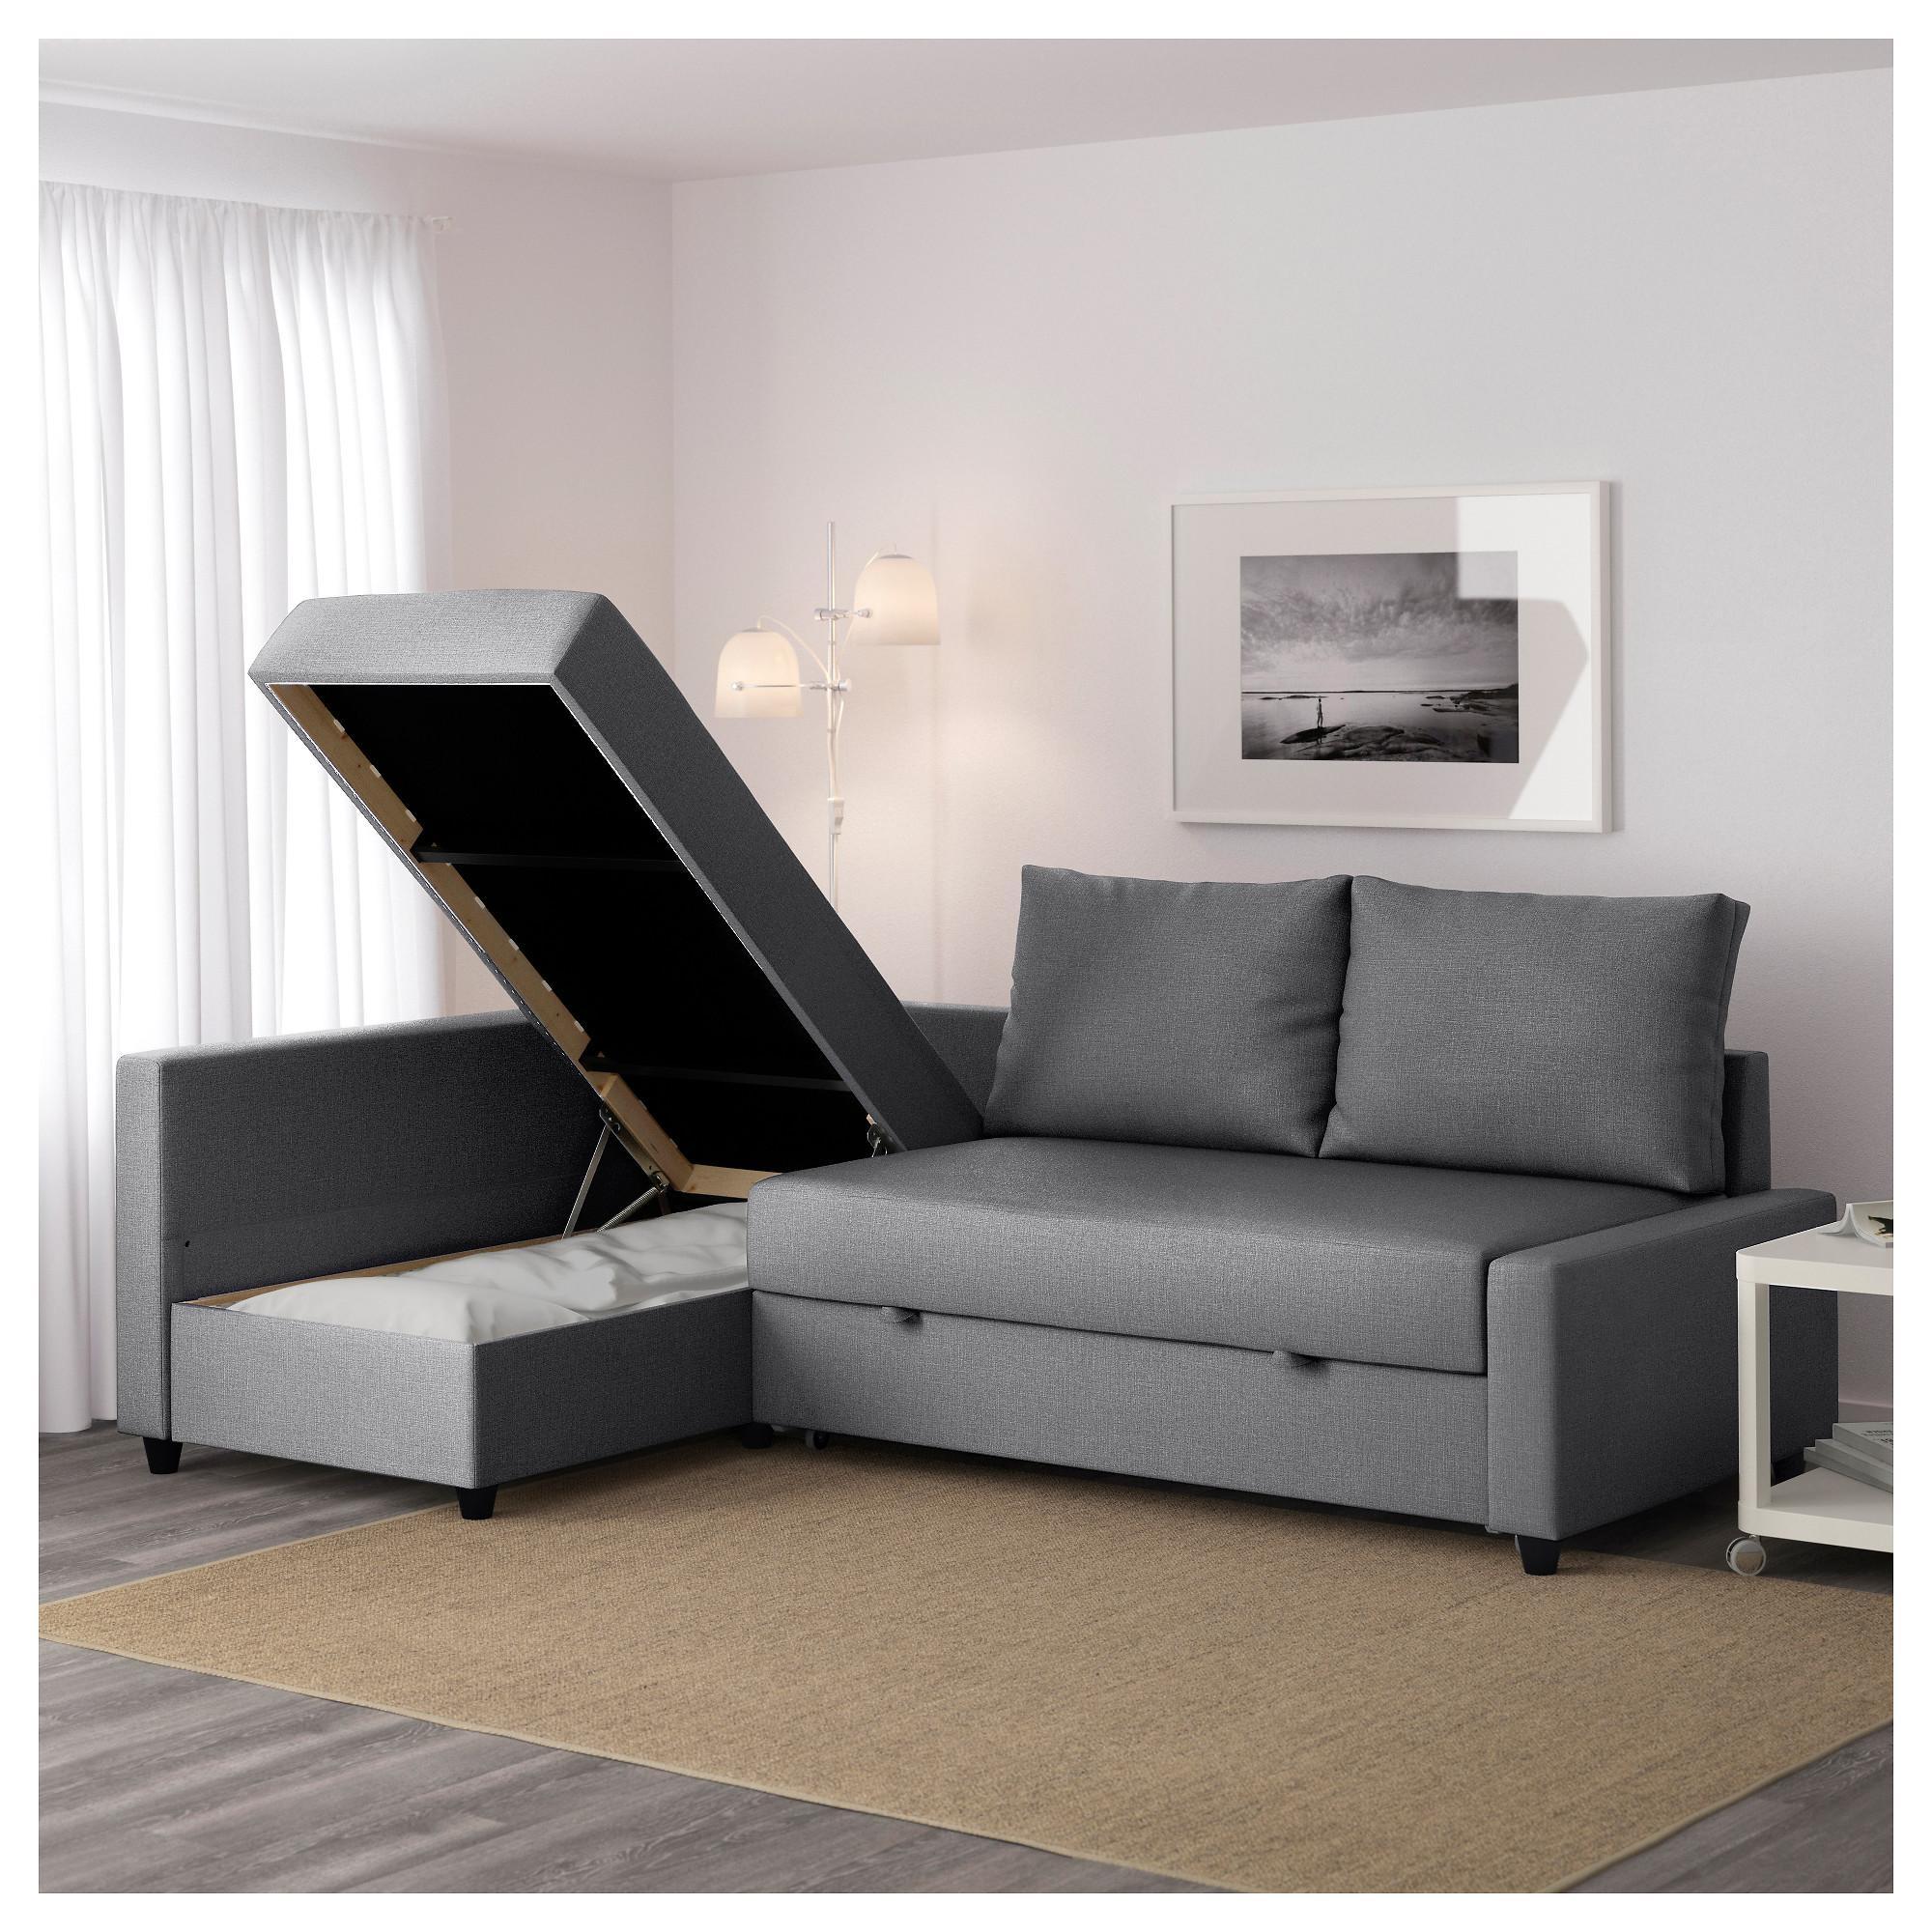 Friheten Corner Sofa Bed With Storage Skiftebo Dark Grey – Ikea In Corner Sofa Bed With Storage Ikea (View 13 of 20)